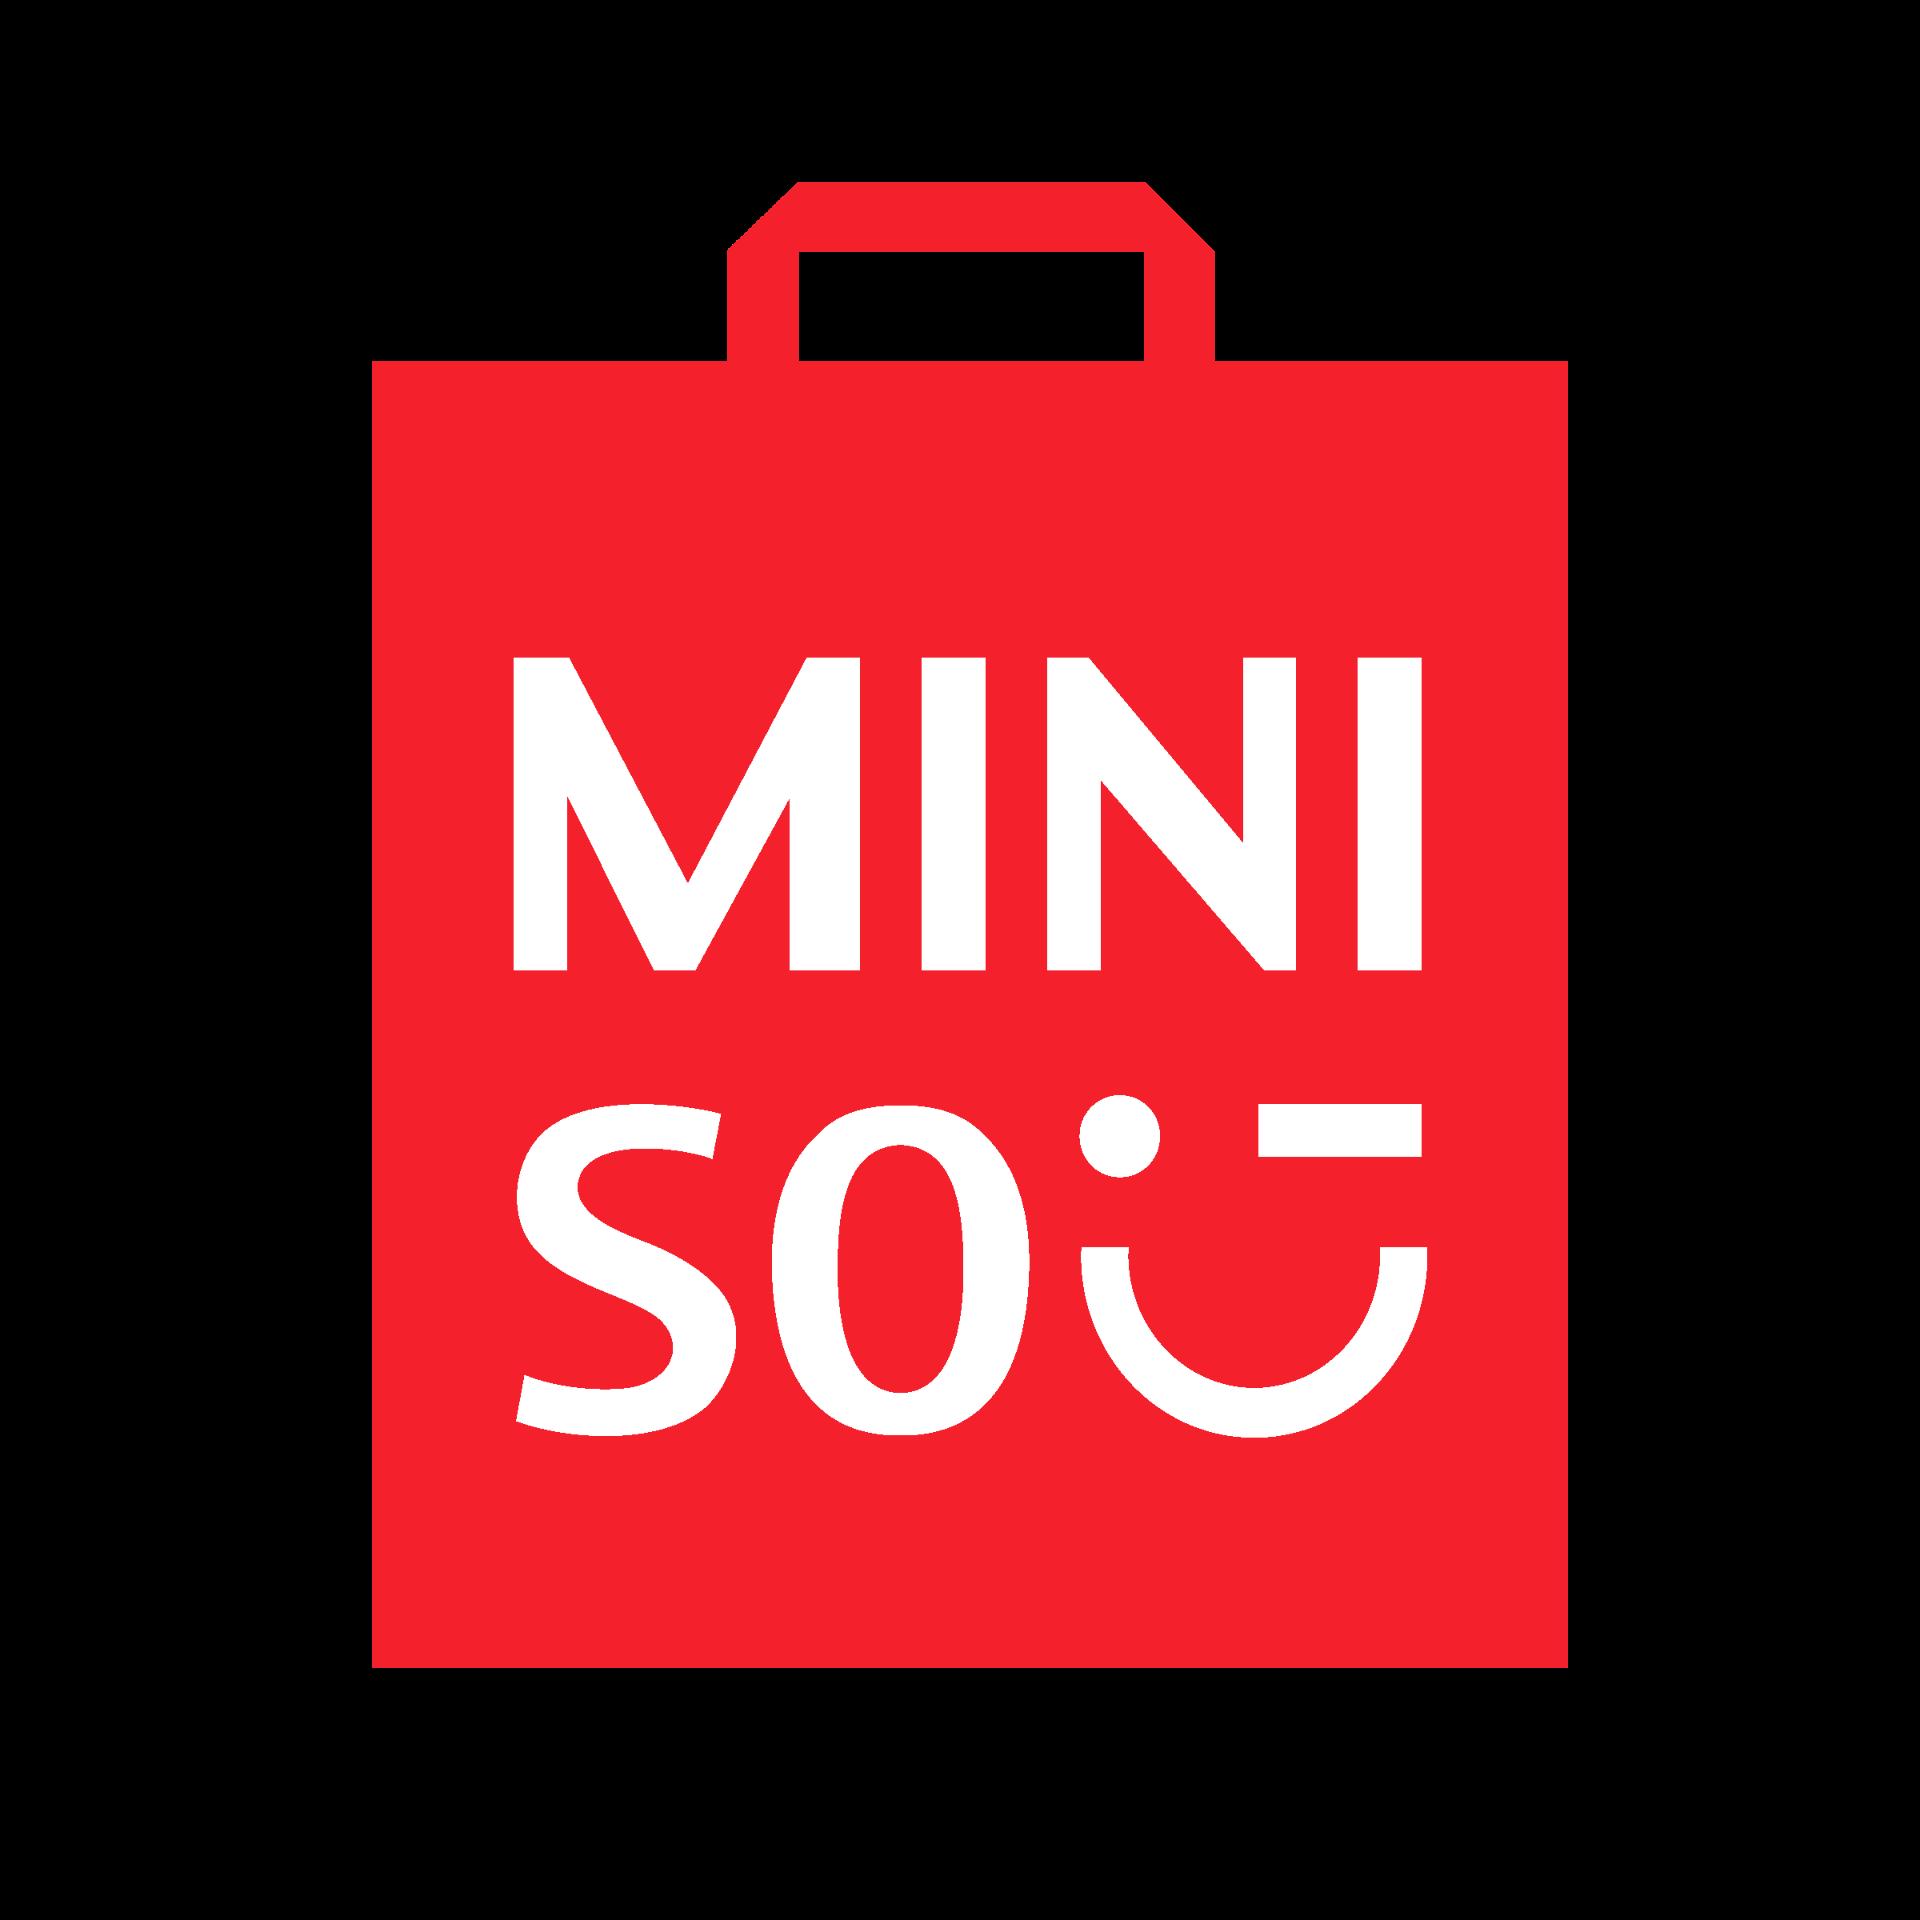 Miniso Brasil